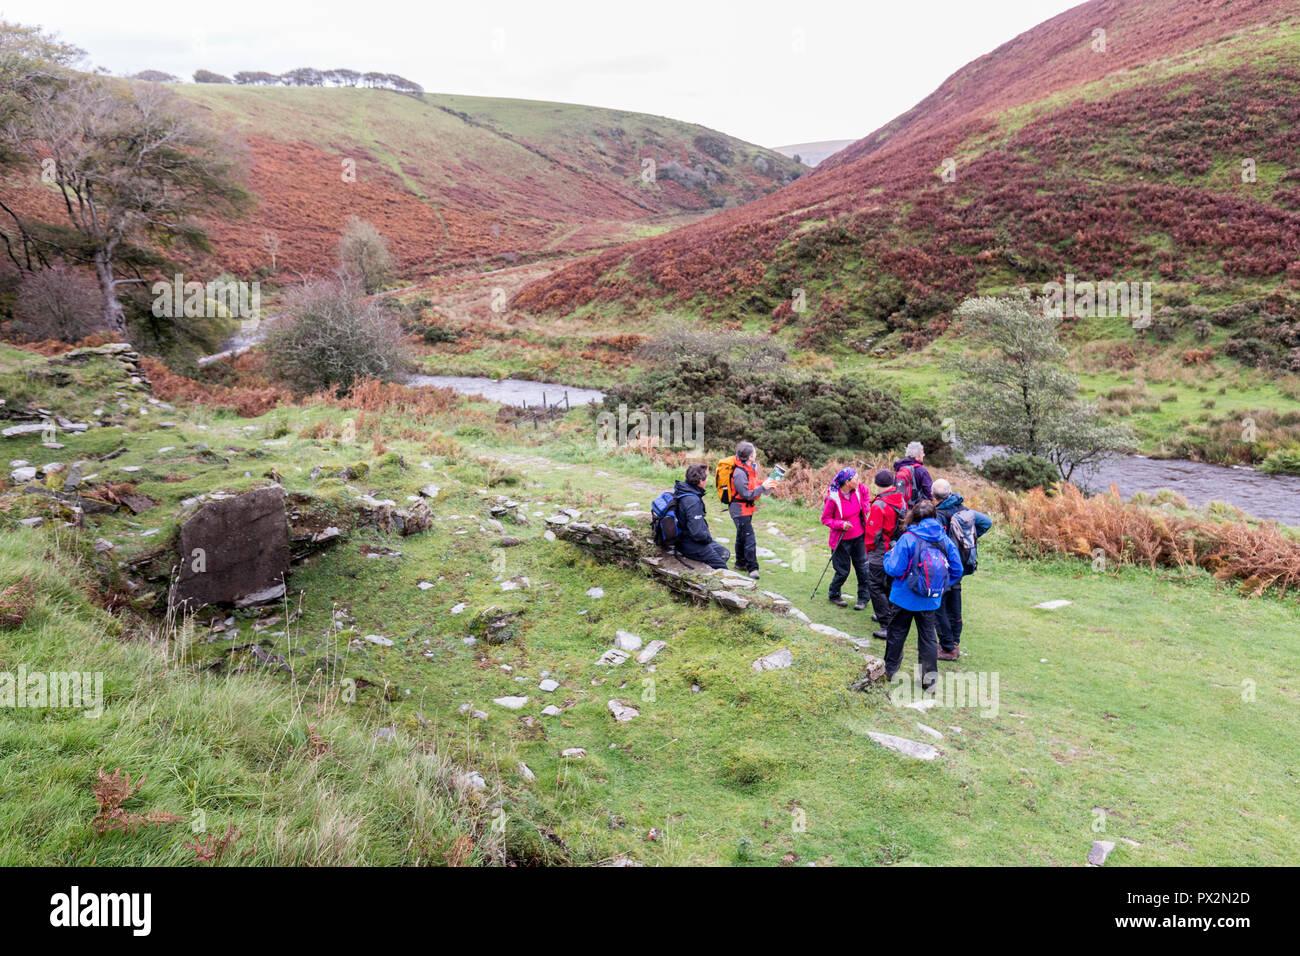 Remains of Wheal Eliza mine on the Two Moors Way, Exmoor, UK - Stock Image